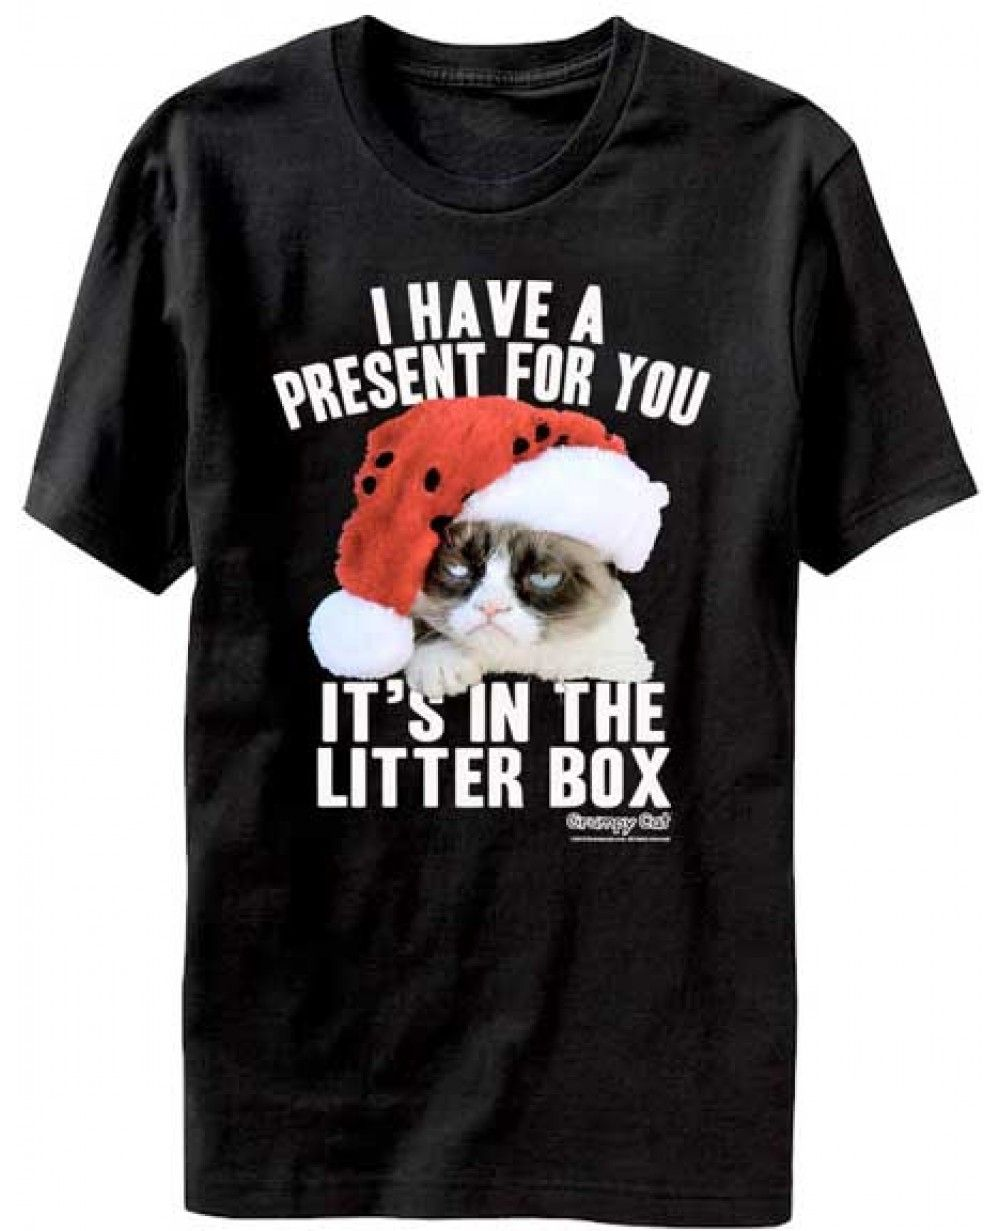 f3b992bec Grumpy Cat Litter Box Christmas T-Shirt | Virtual Closet / Clothes ...